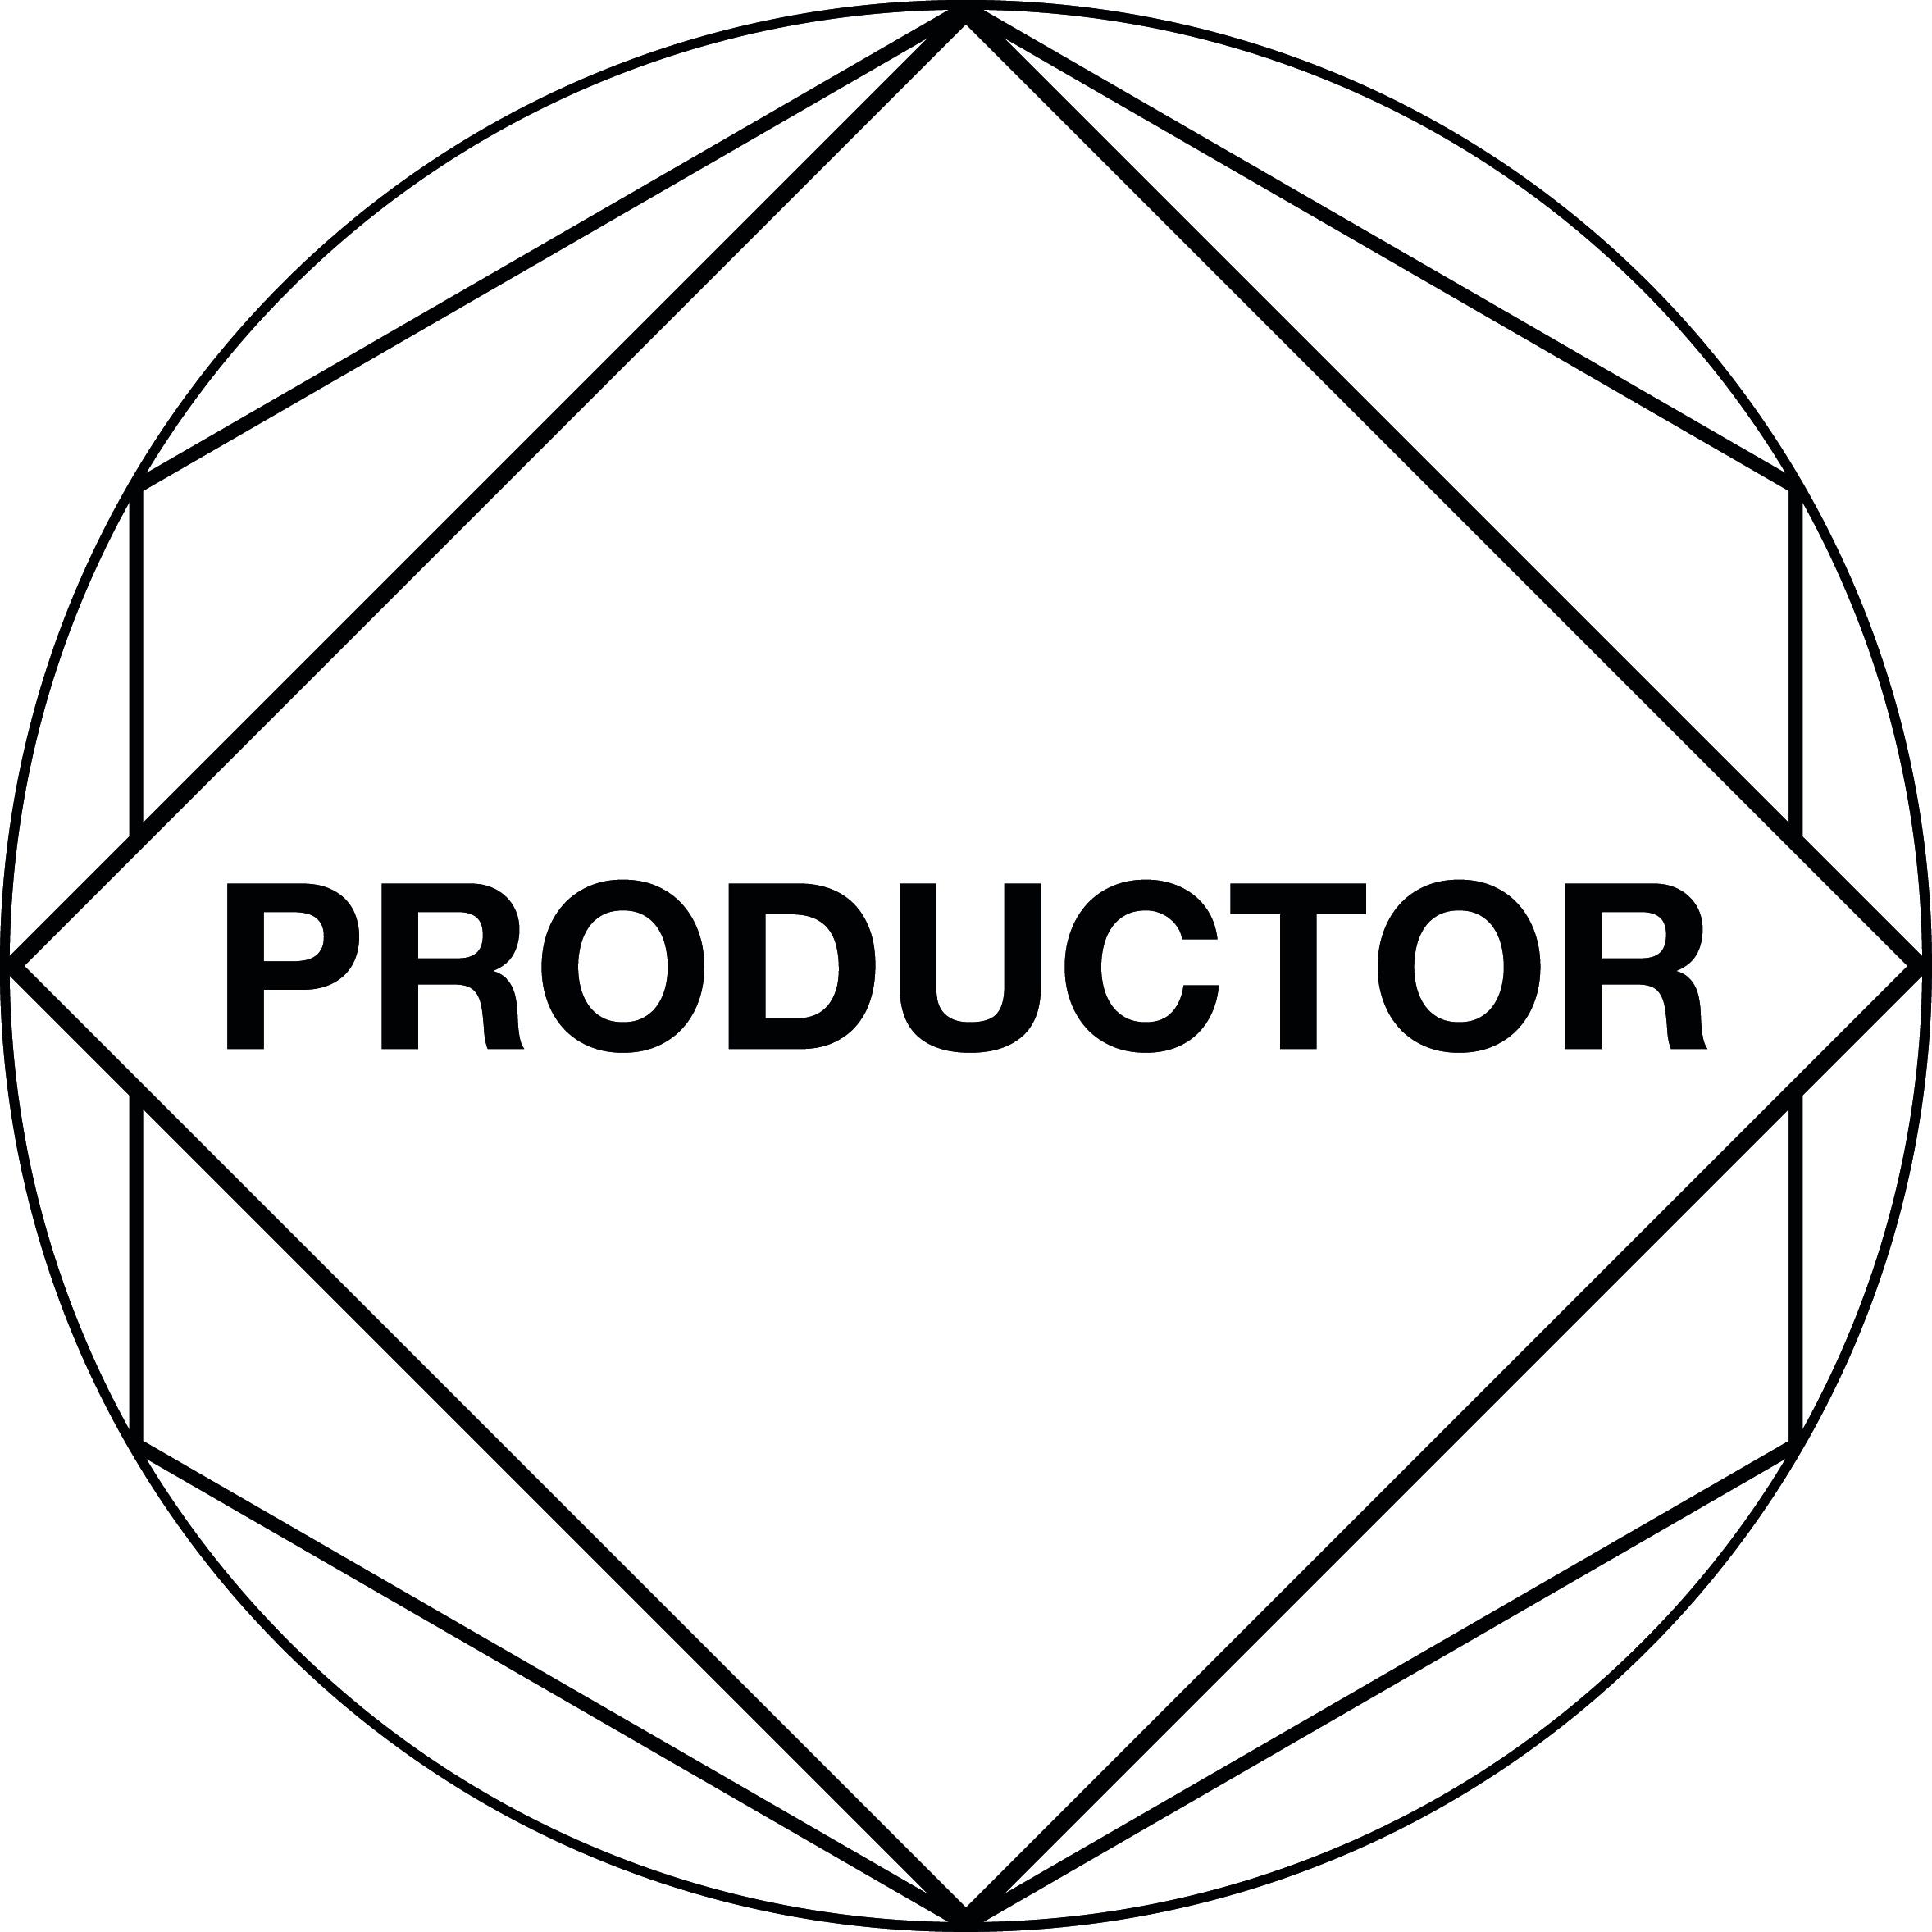 PRODUCTOR_LOGO (1).jpg